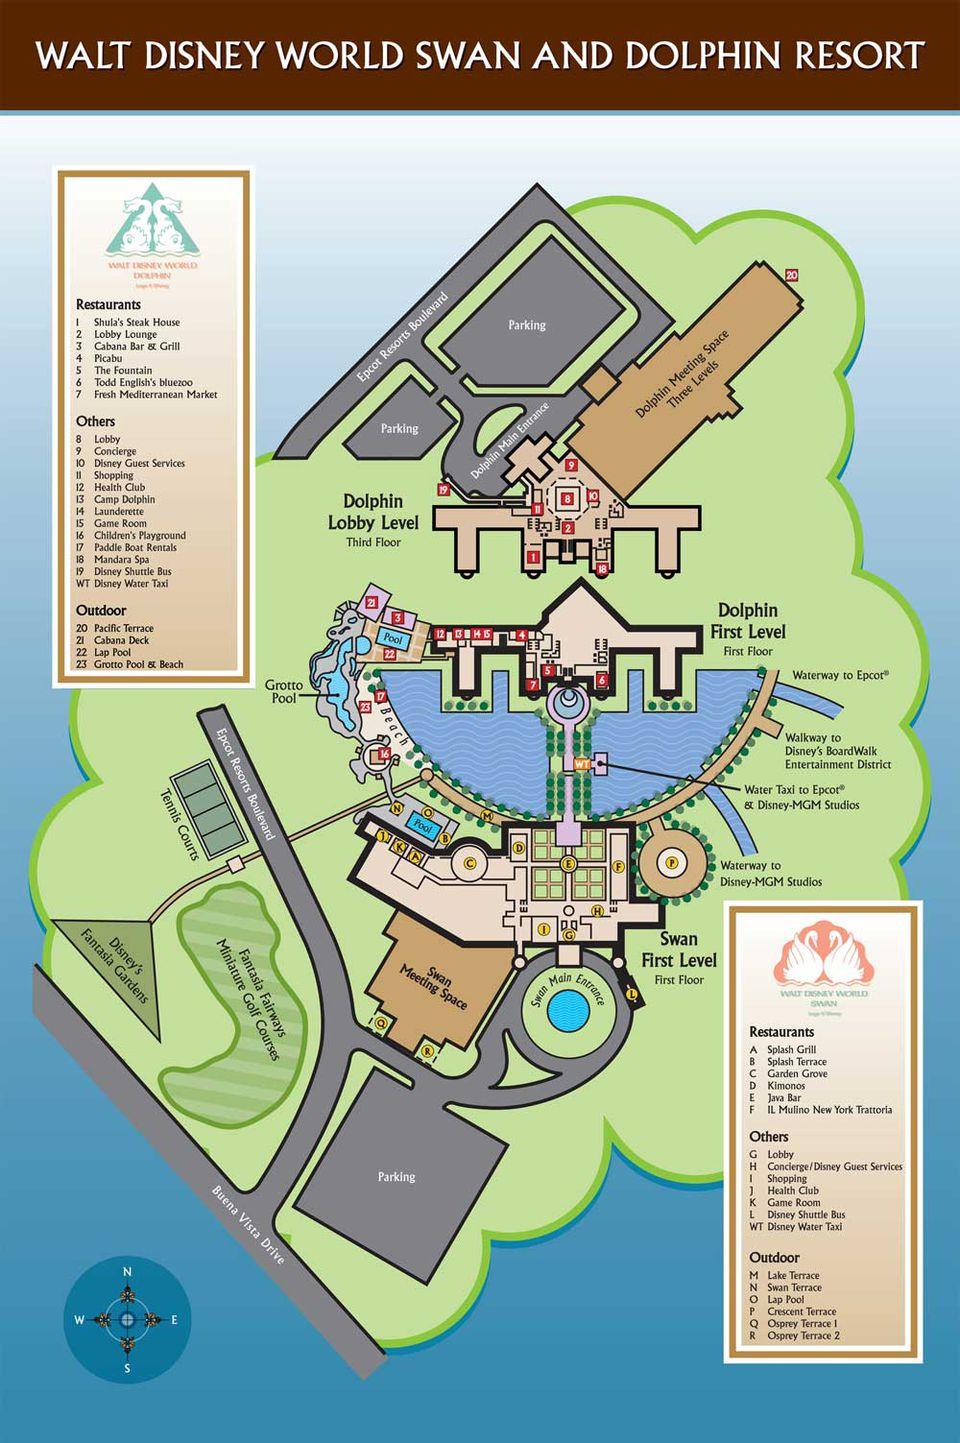 Disney World Swan and Dophin Disney Map. Disney World Maps for Each Resort